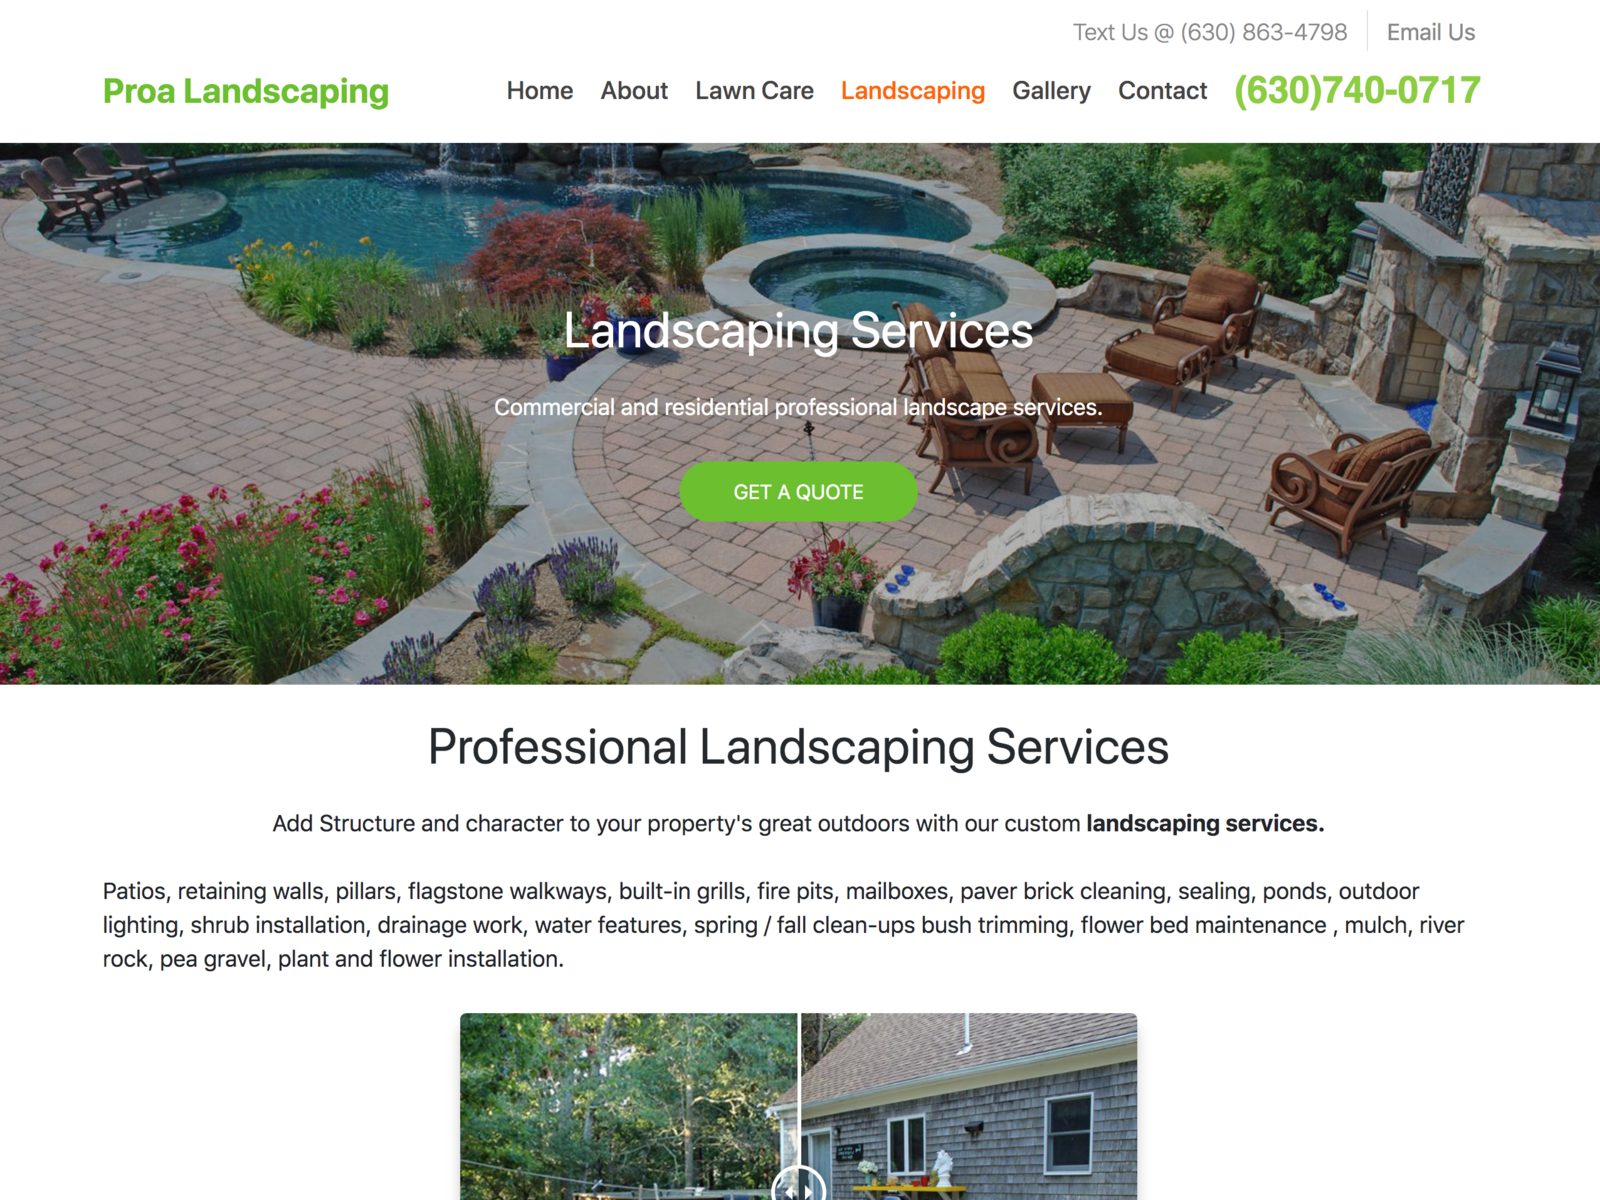 Landscaping Website Development By Inova Web Design On Dribbble